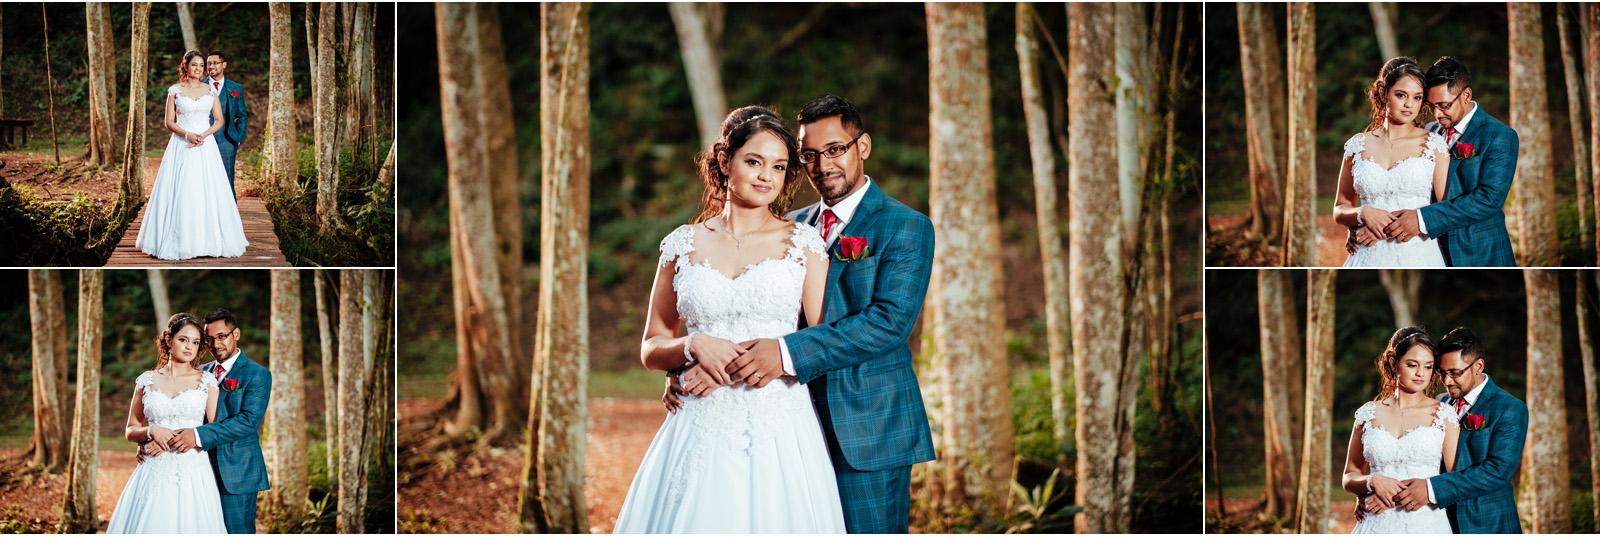 Pietermaritzberg Wedding Photography RBadal Wingrove Valley